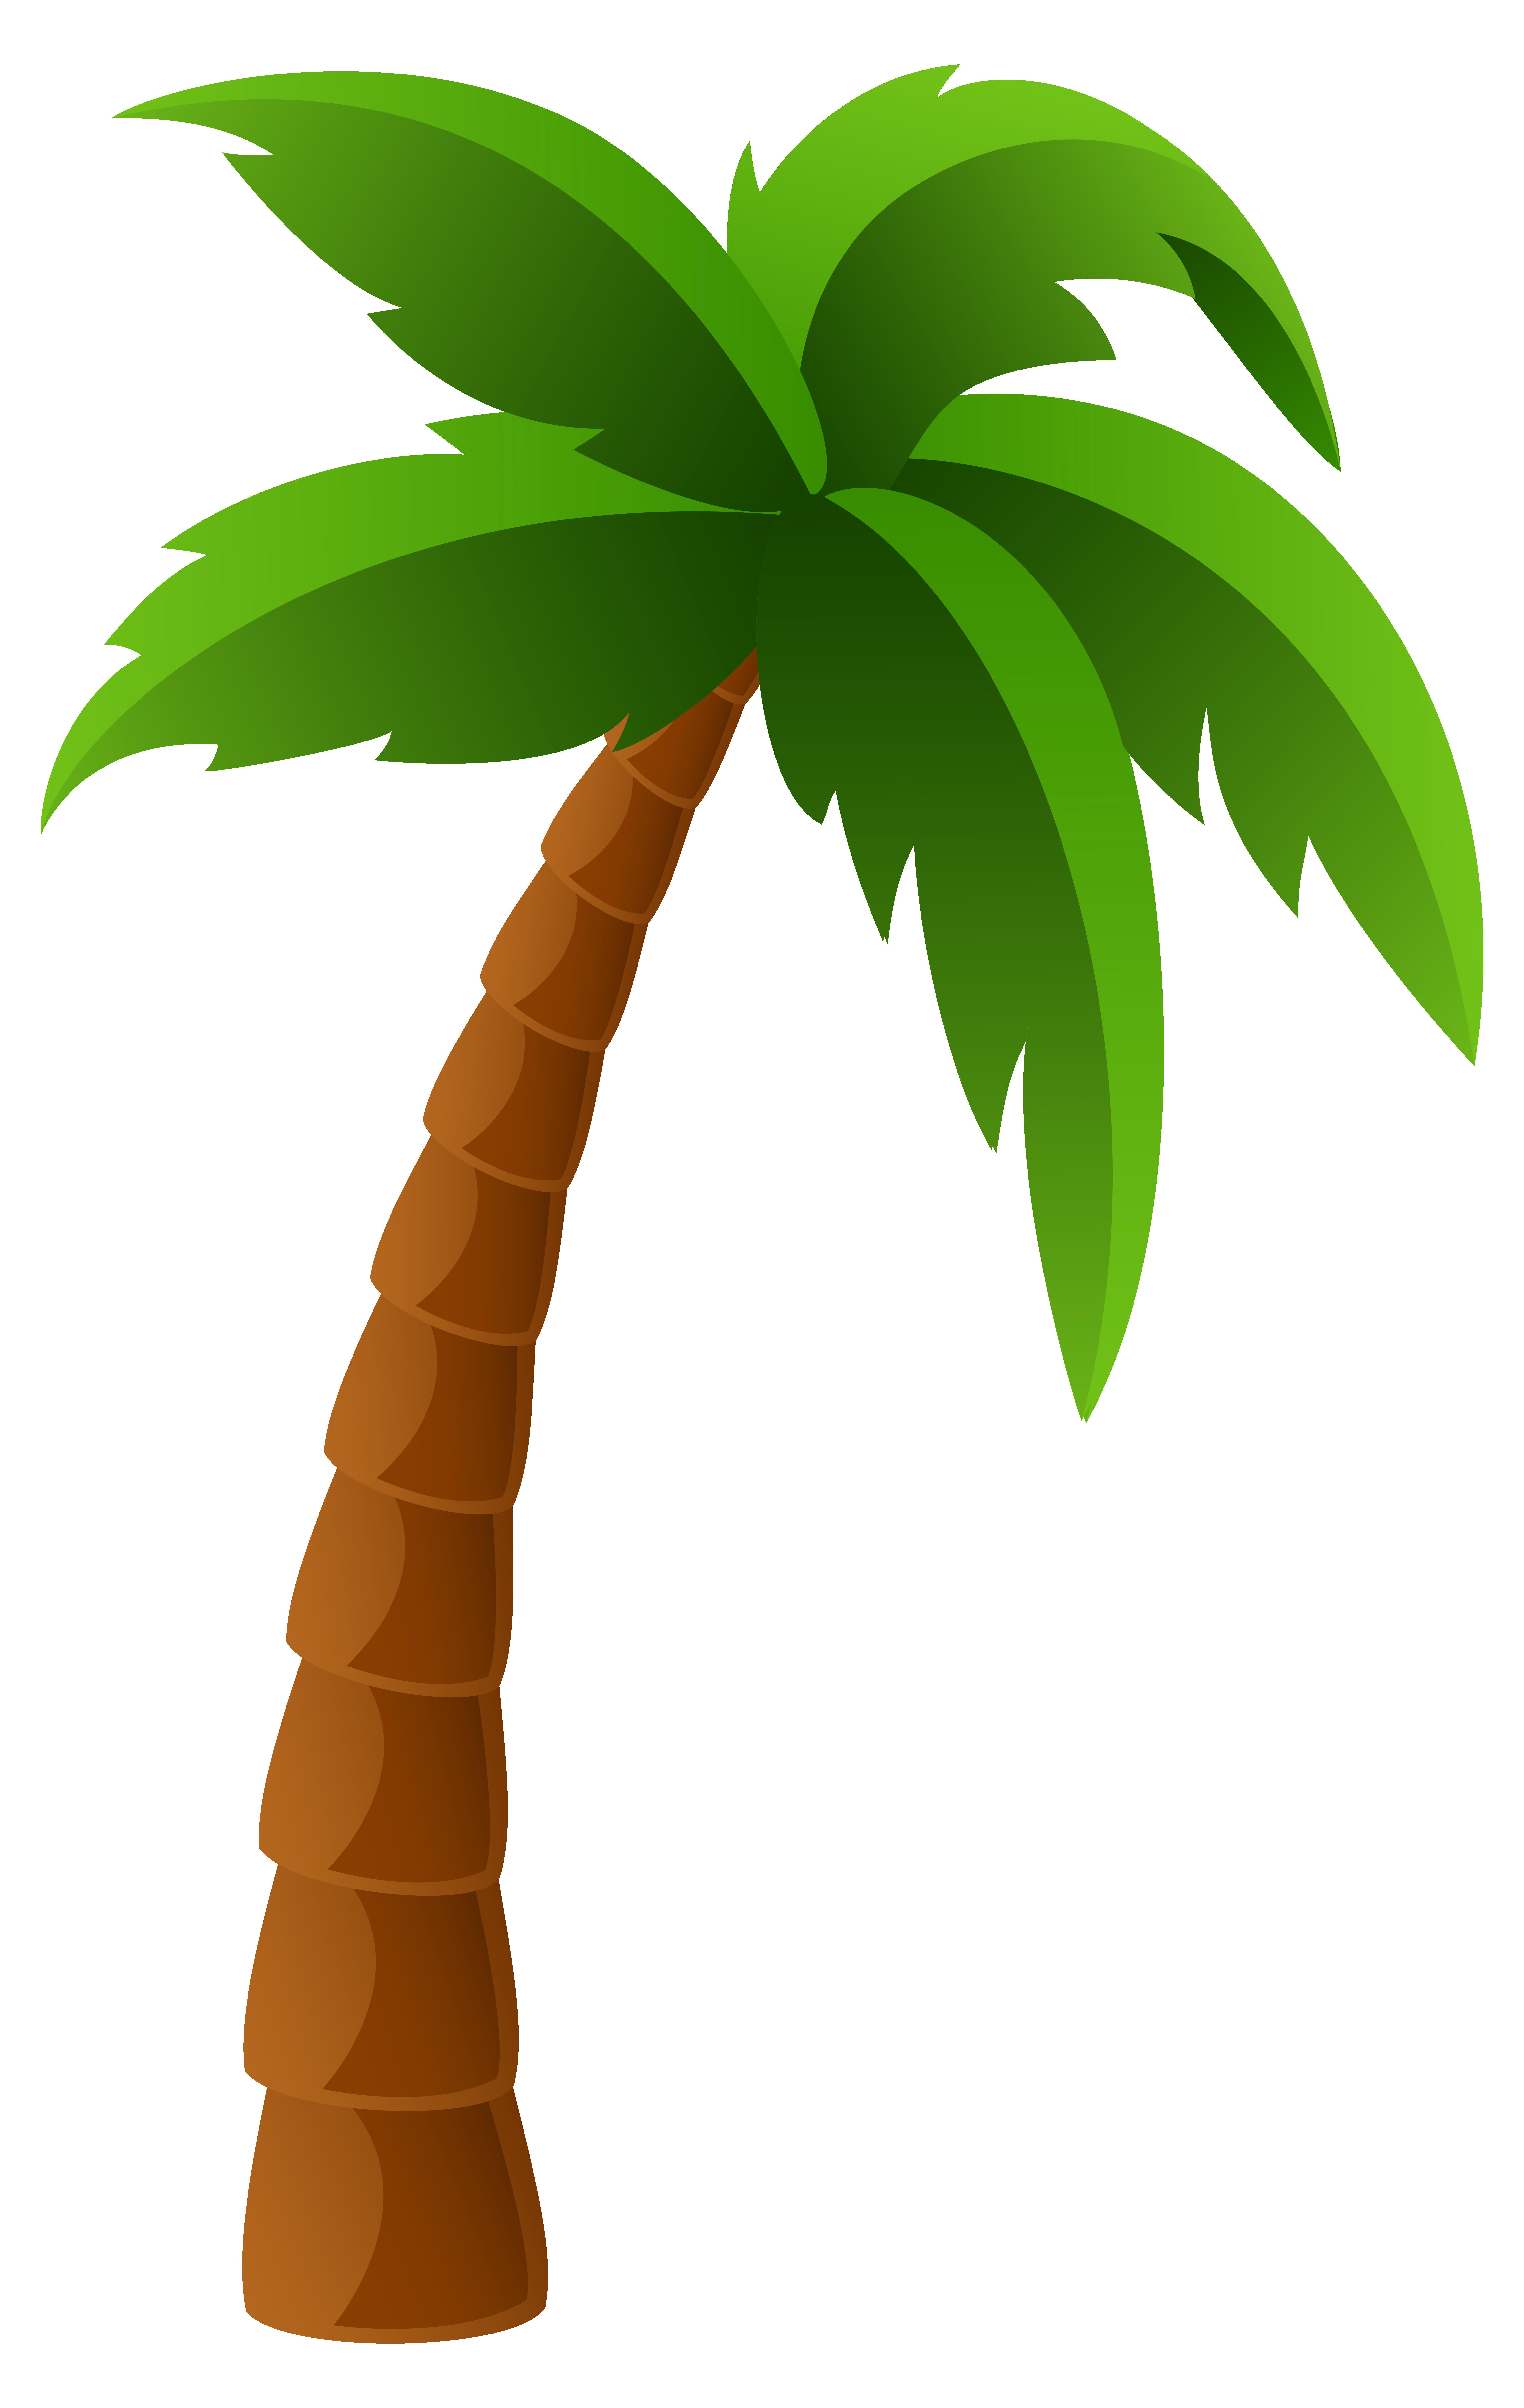 Palm Tree Clip Art 3 - Palm Tree, Transparent background PNG HD thumbnail